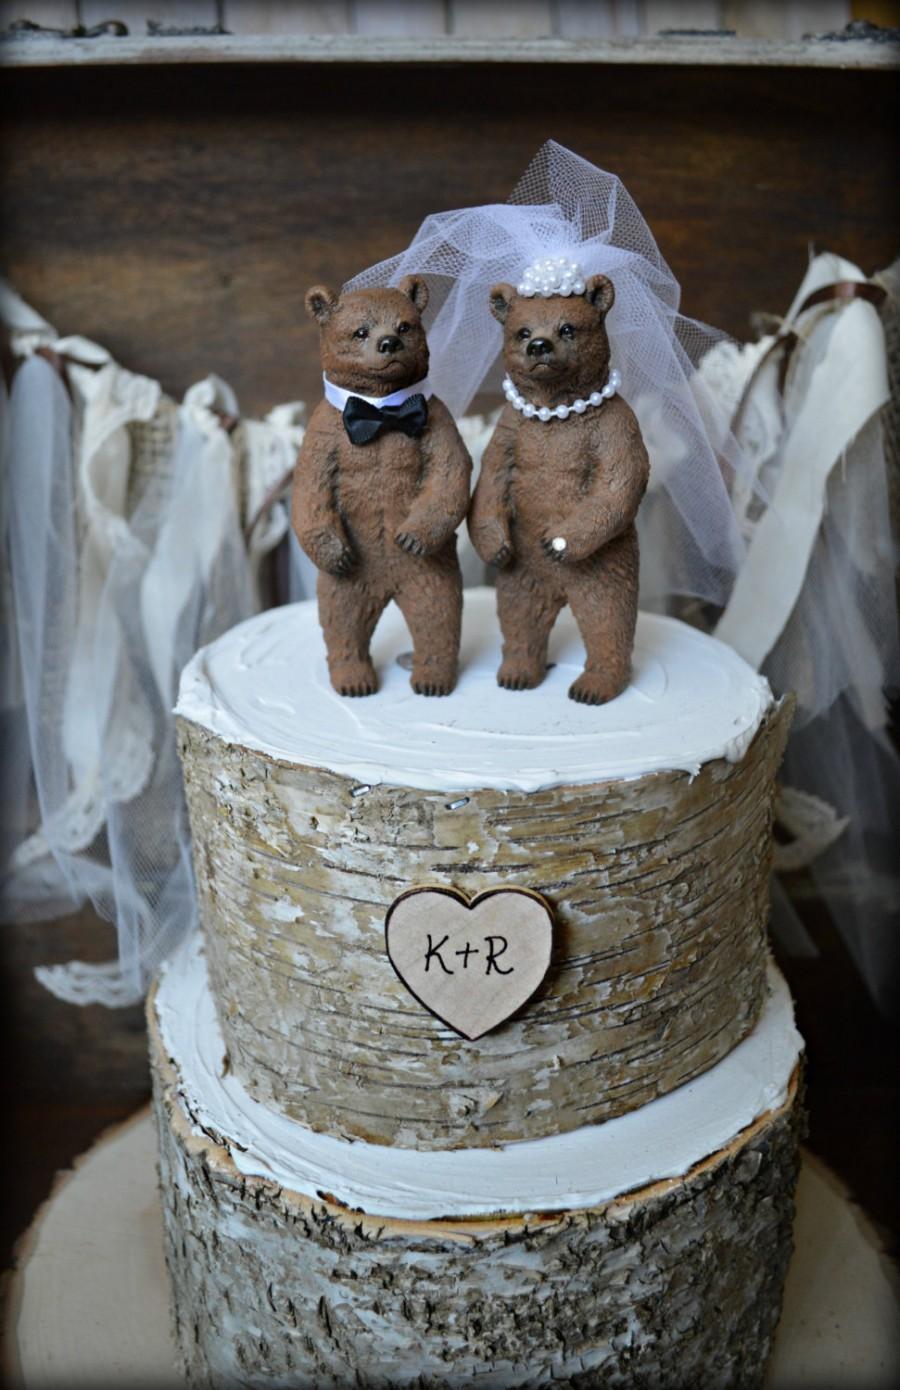 زفاف - Bear wedding cake topper-bears-bear lover-black bear-grizzley bear-brown bear-bear lover-bear wedding-rustic wedding-fall wedding-kissing